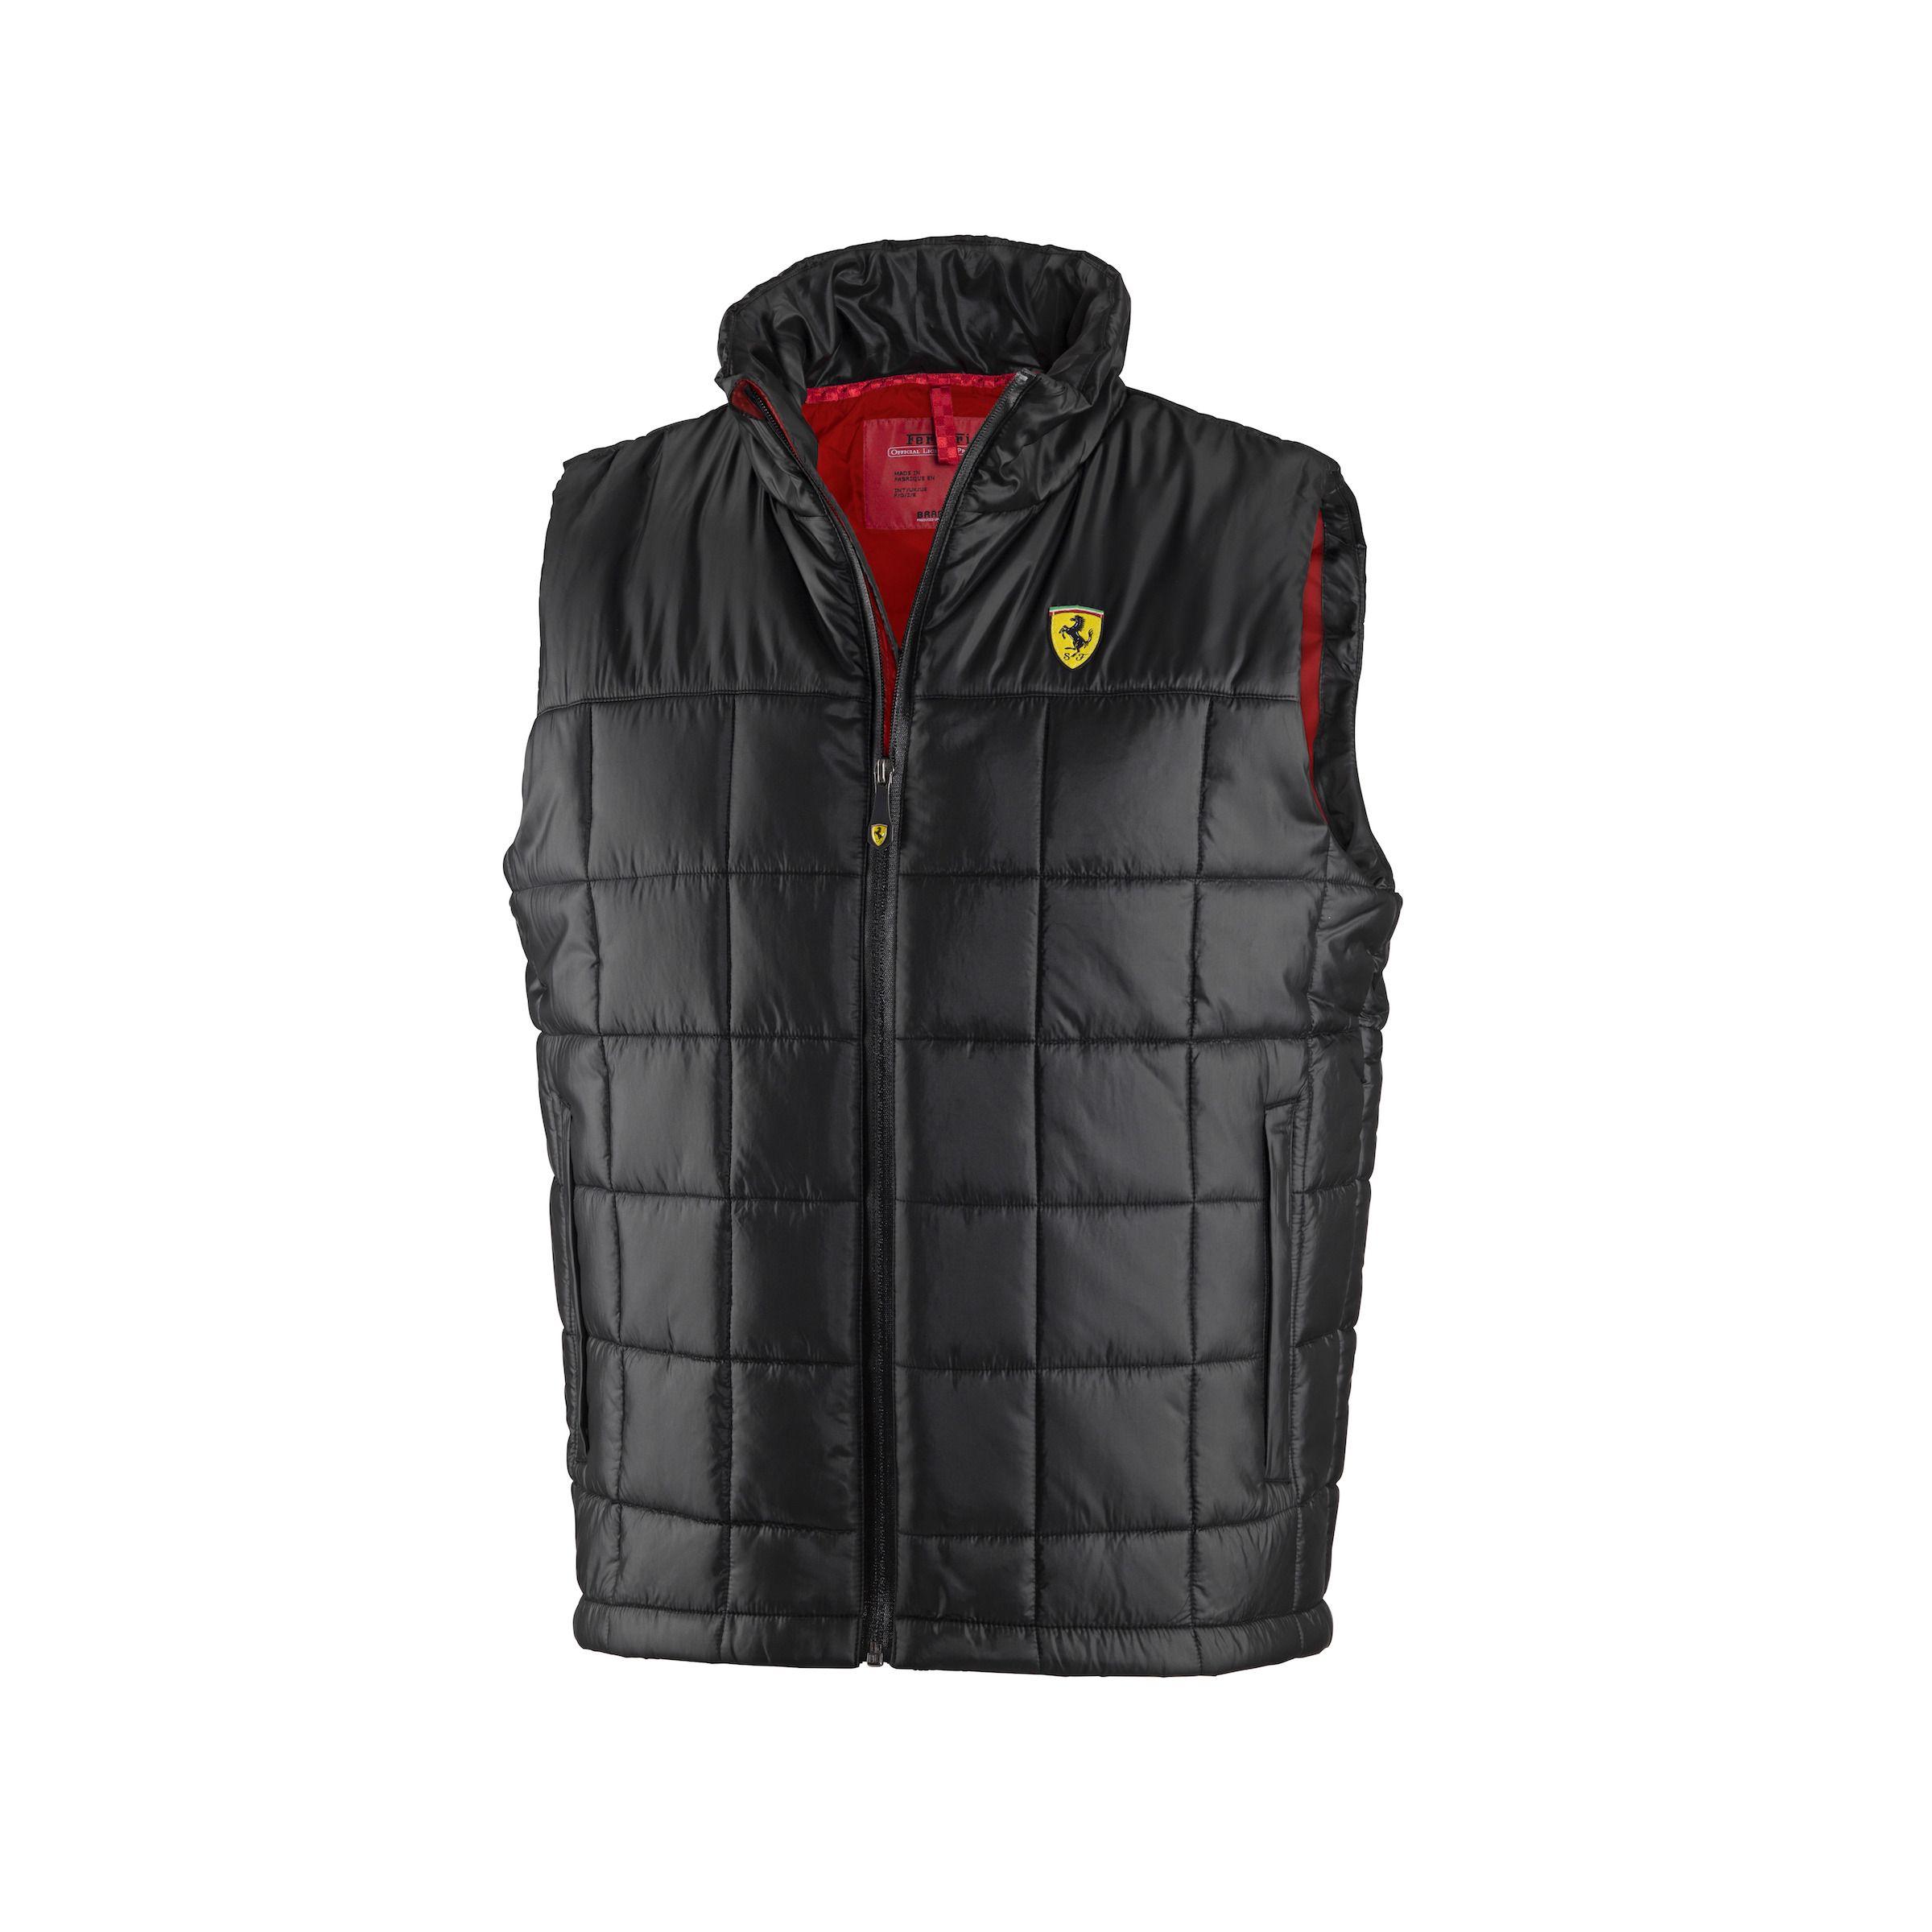 Kamizelka Ferrari Quilted Padded Vest - Black CZARNY | FERRARI MEN ... : quilted racing jacket - Adamdwight.com